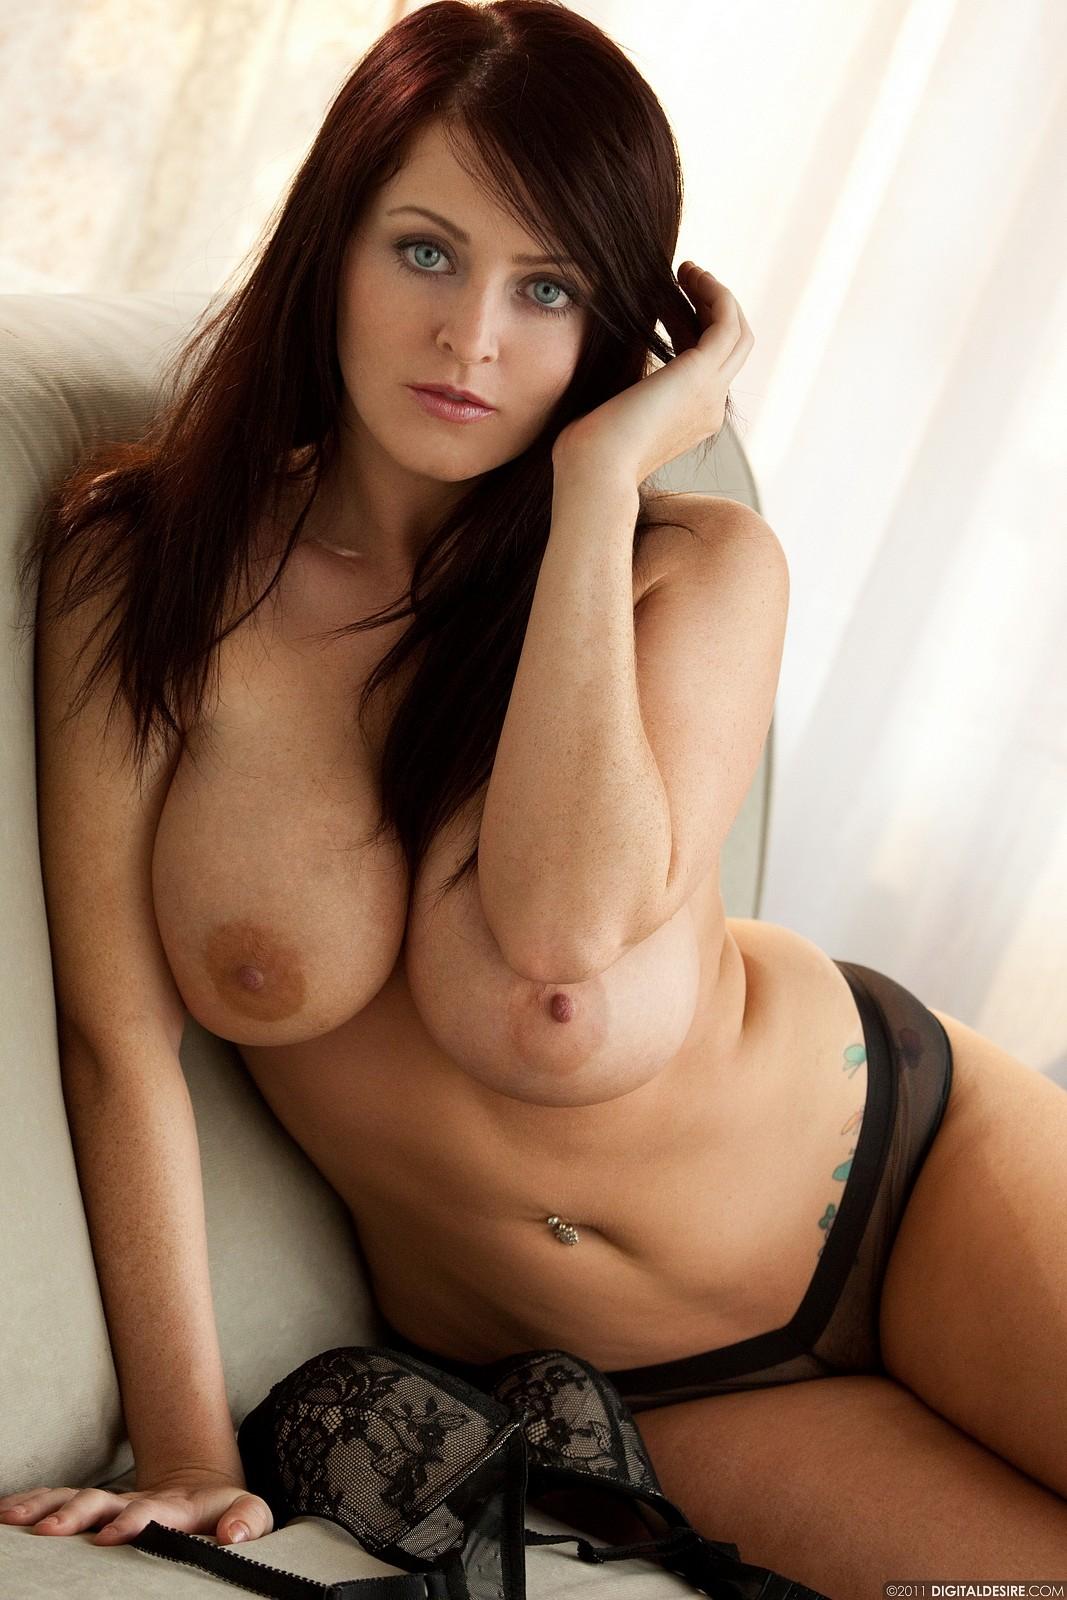 huge-boobs-tits-naked-mix-vol5-41